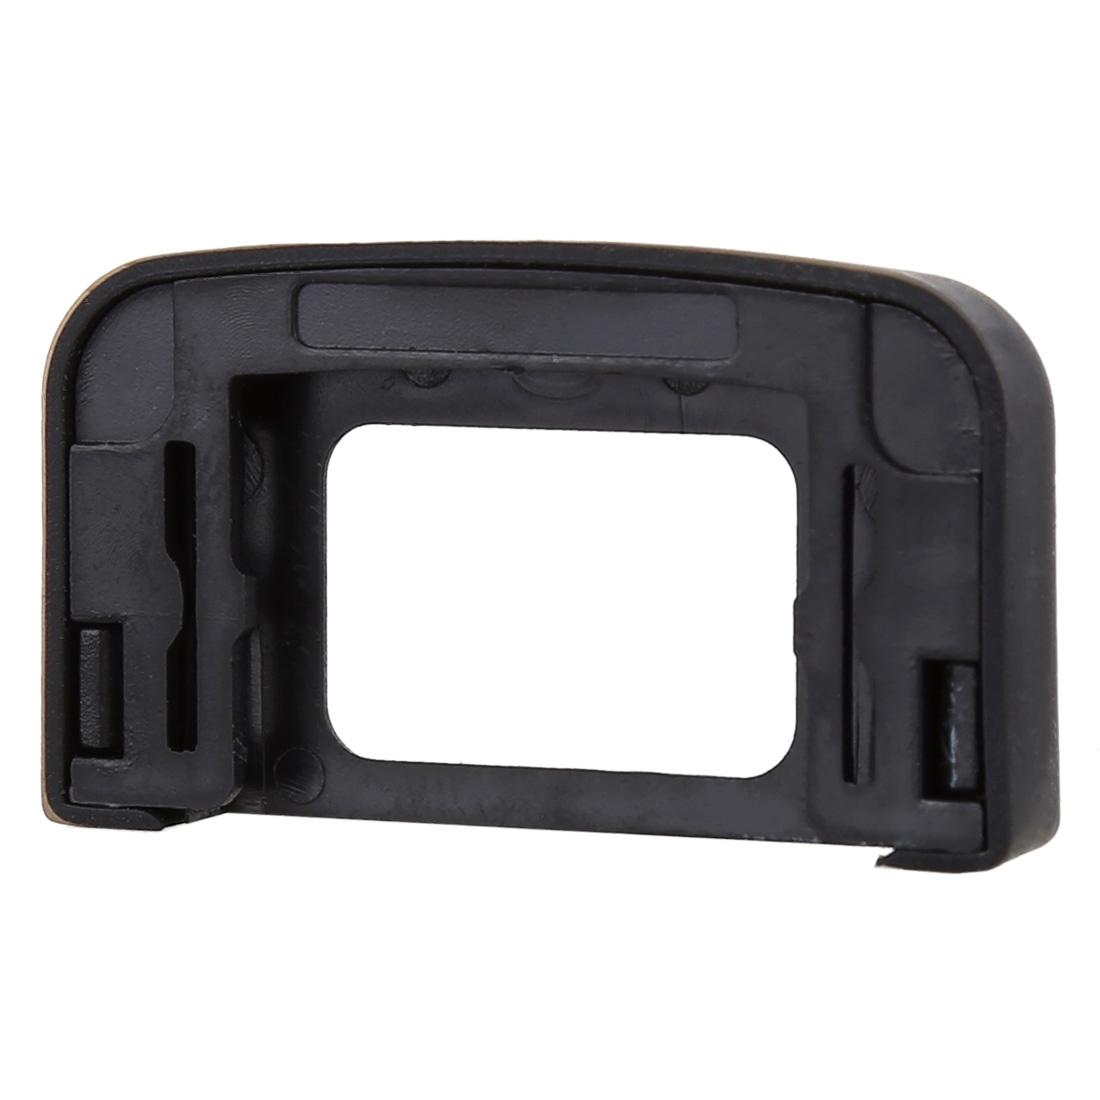 D5300 D5200 D5500 Camera Cases /& Accessory DK-25 Eyepiece Eyecup for Nikon D5600 D3400 D3300 D3200